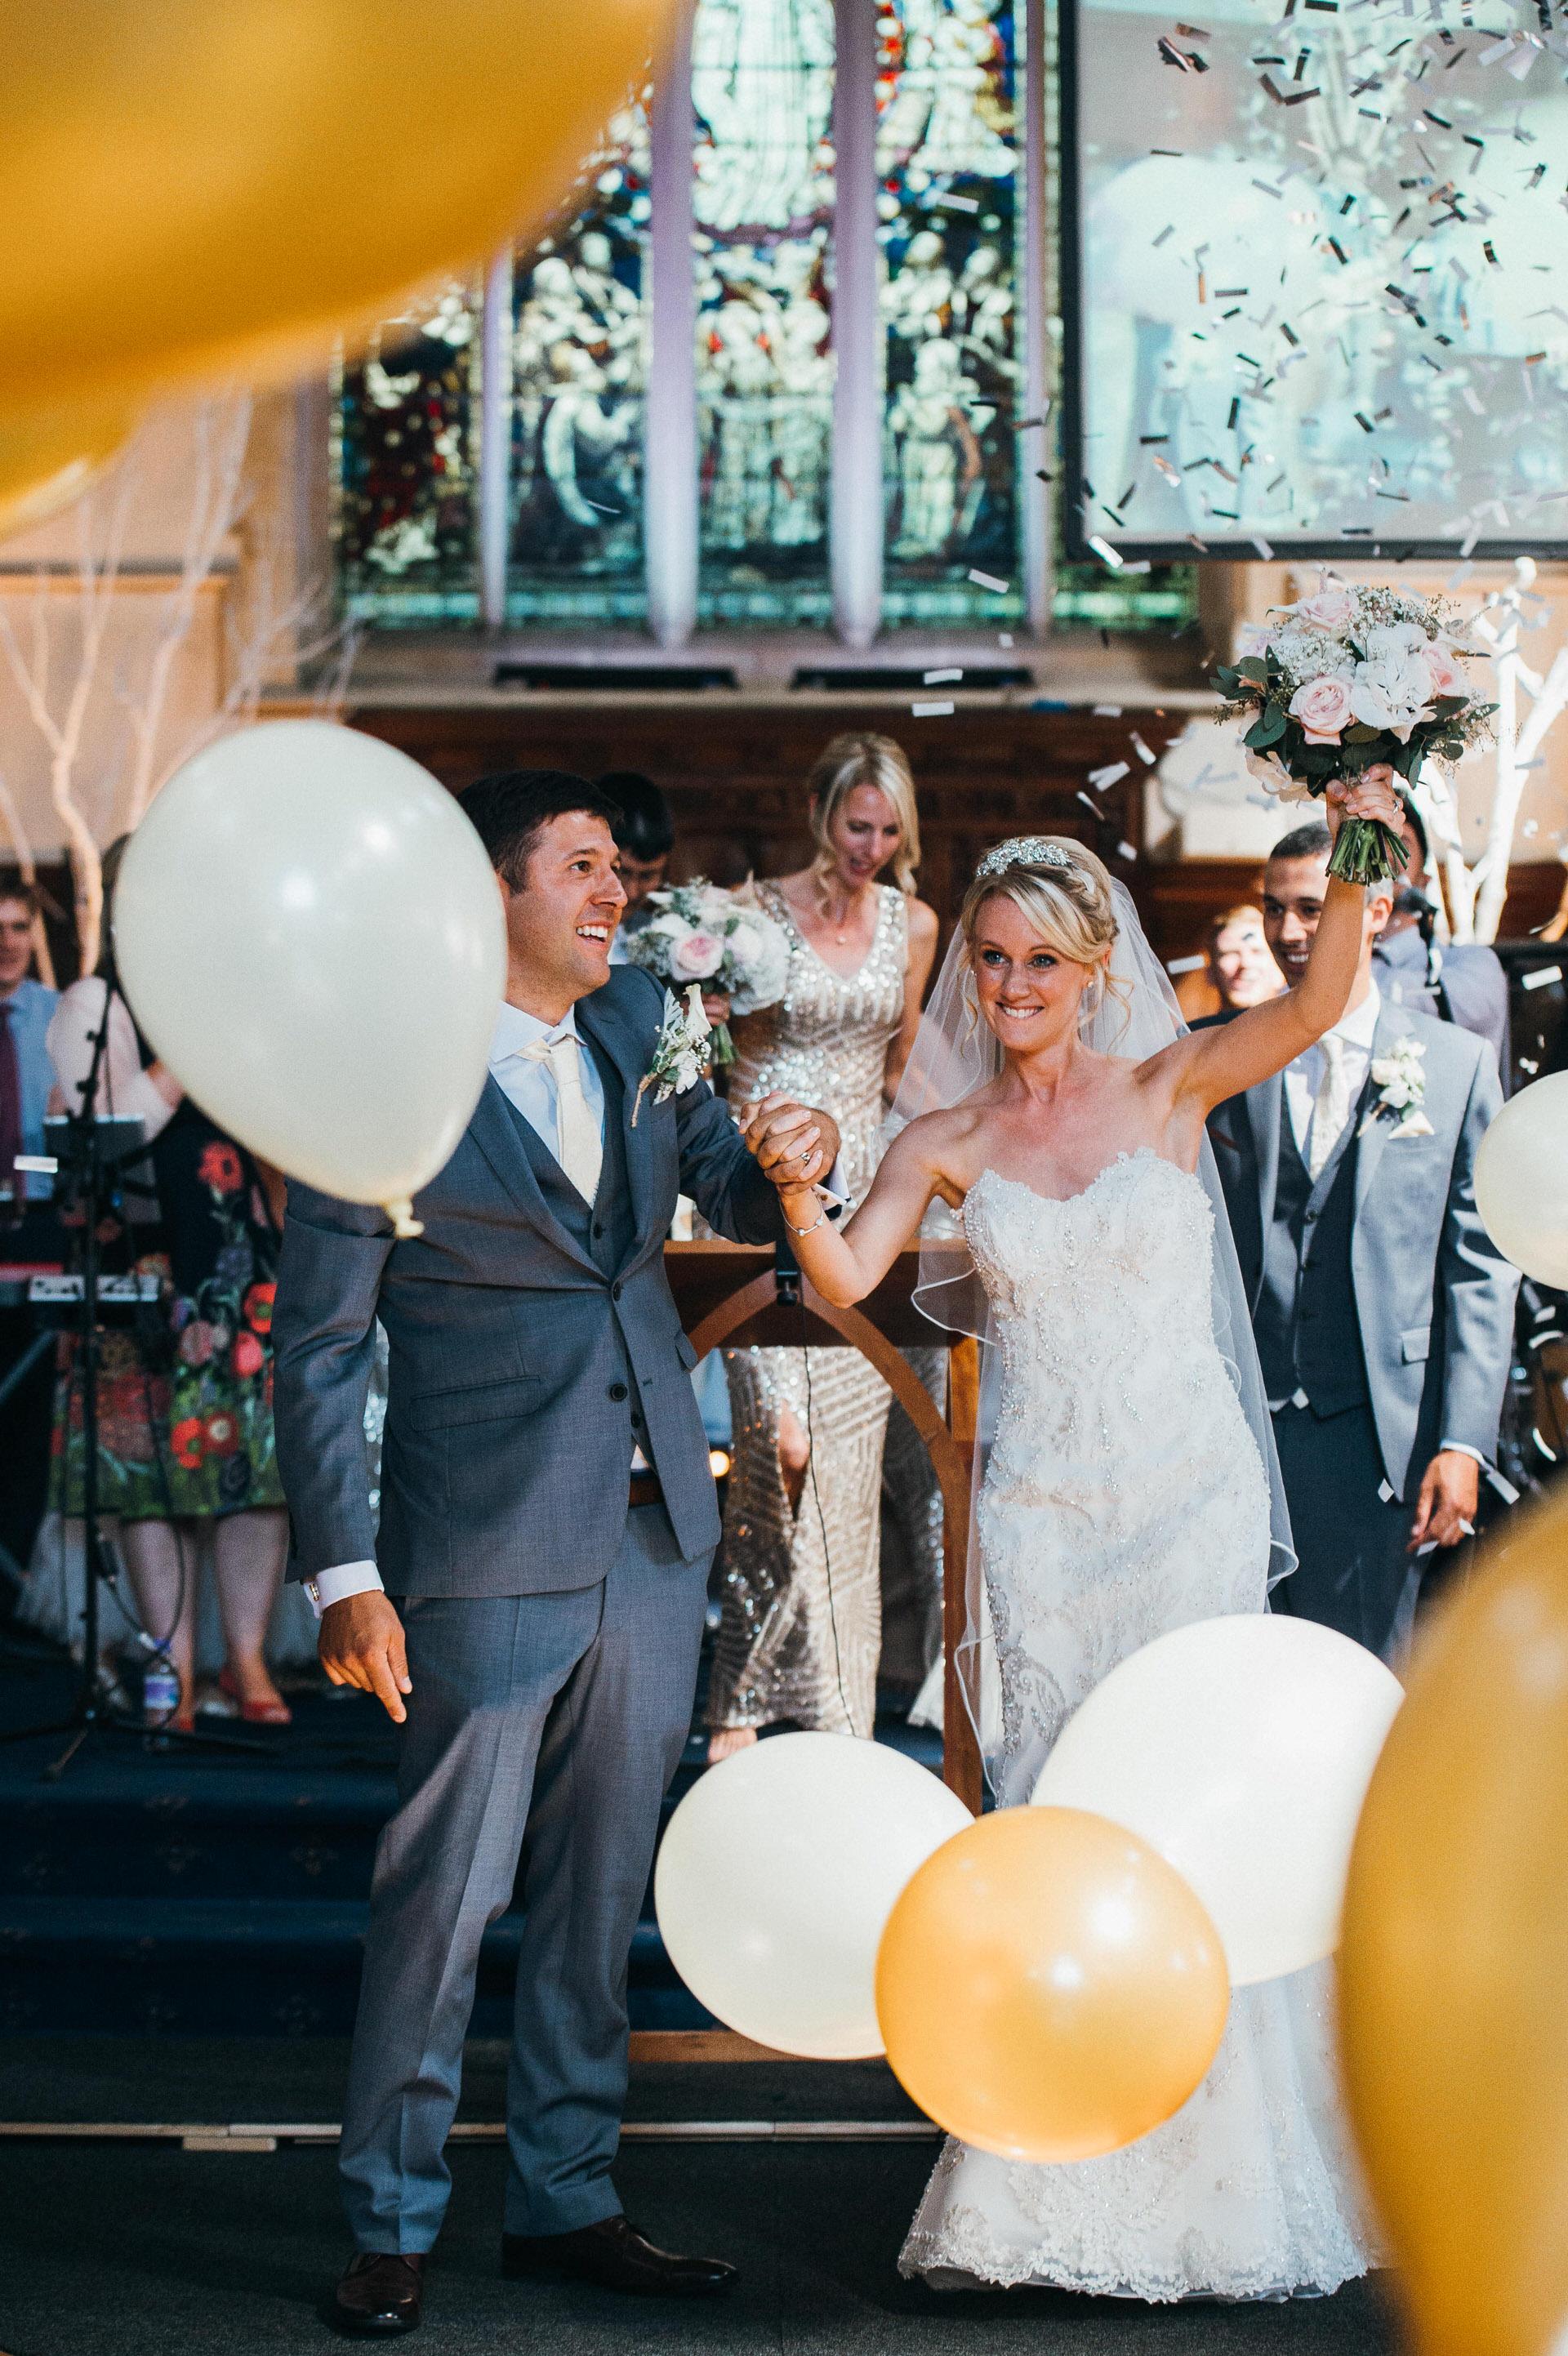 St Saviour's Church Guildford wedding